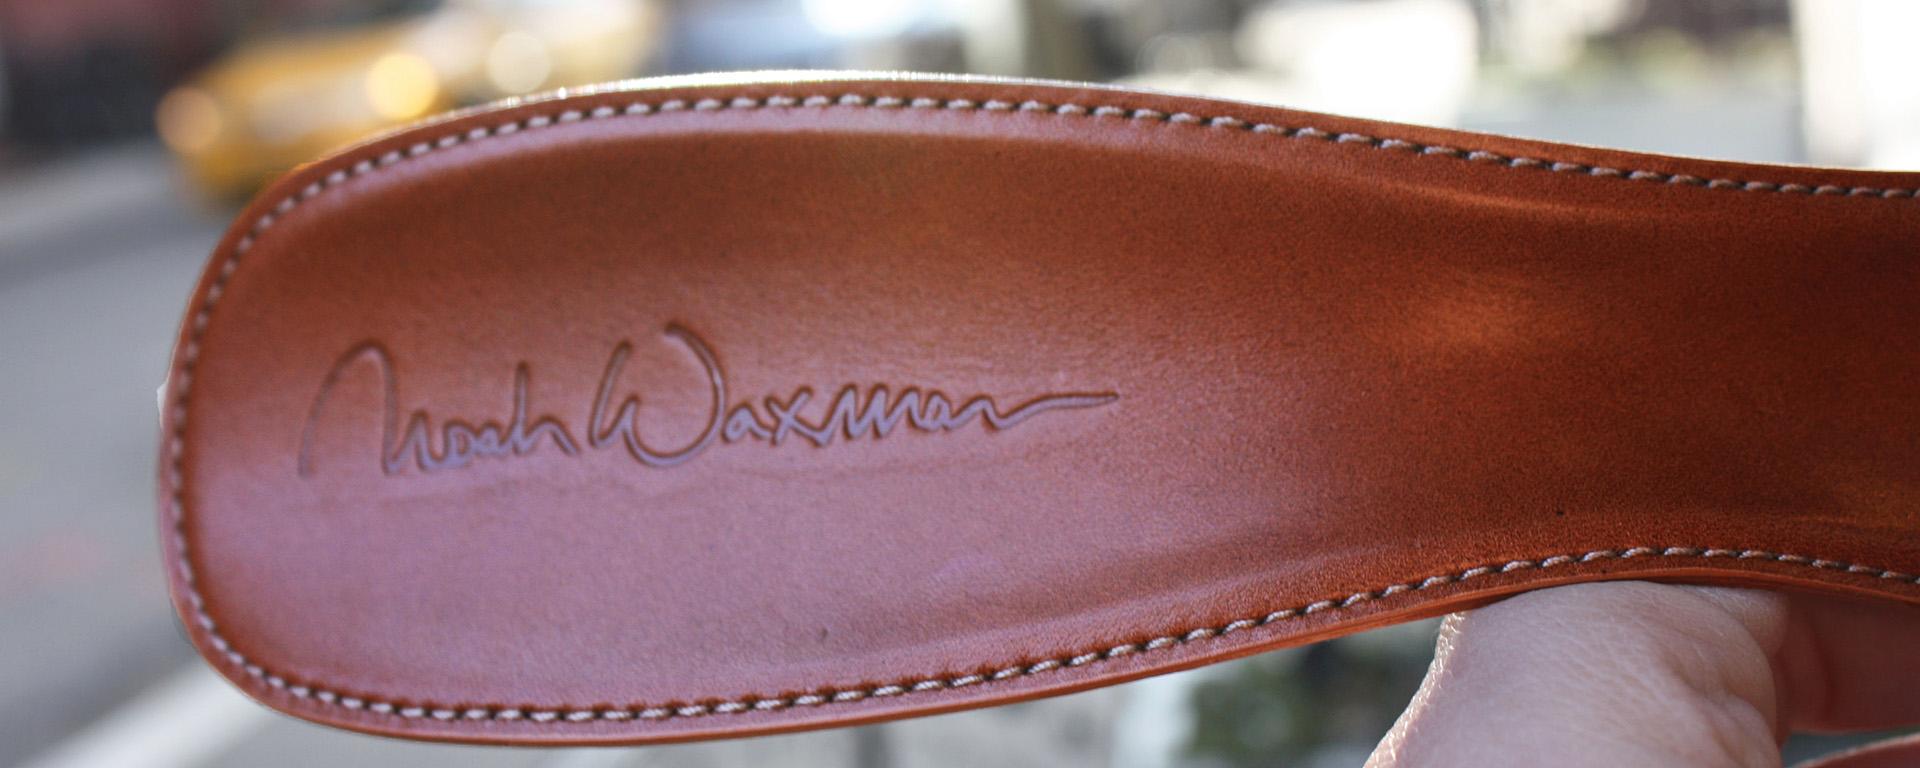 noah waxman American luxury shoemaker handmade leather shoehorn